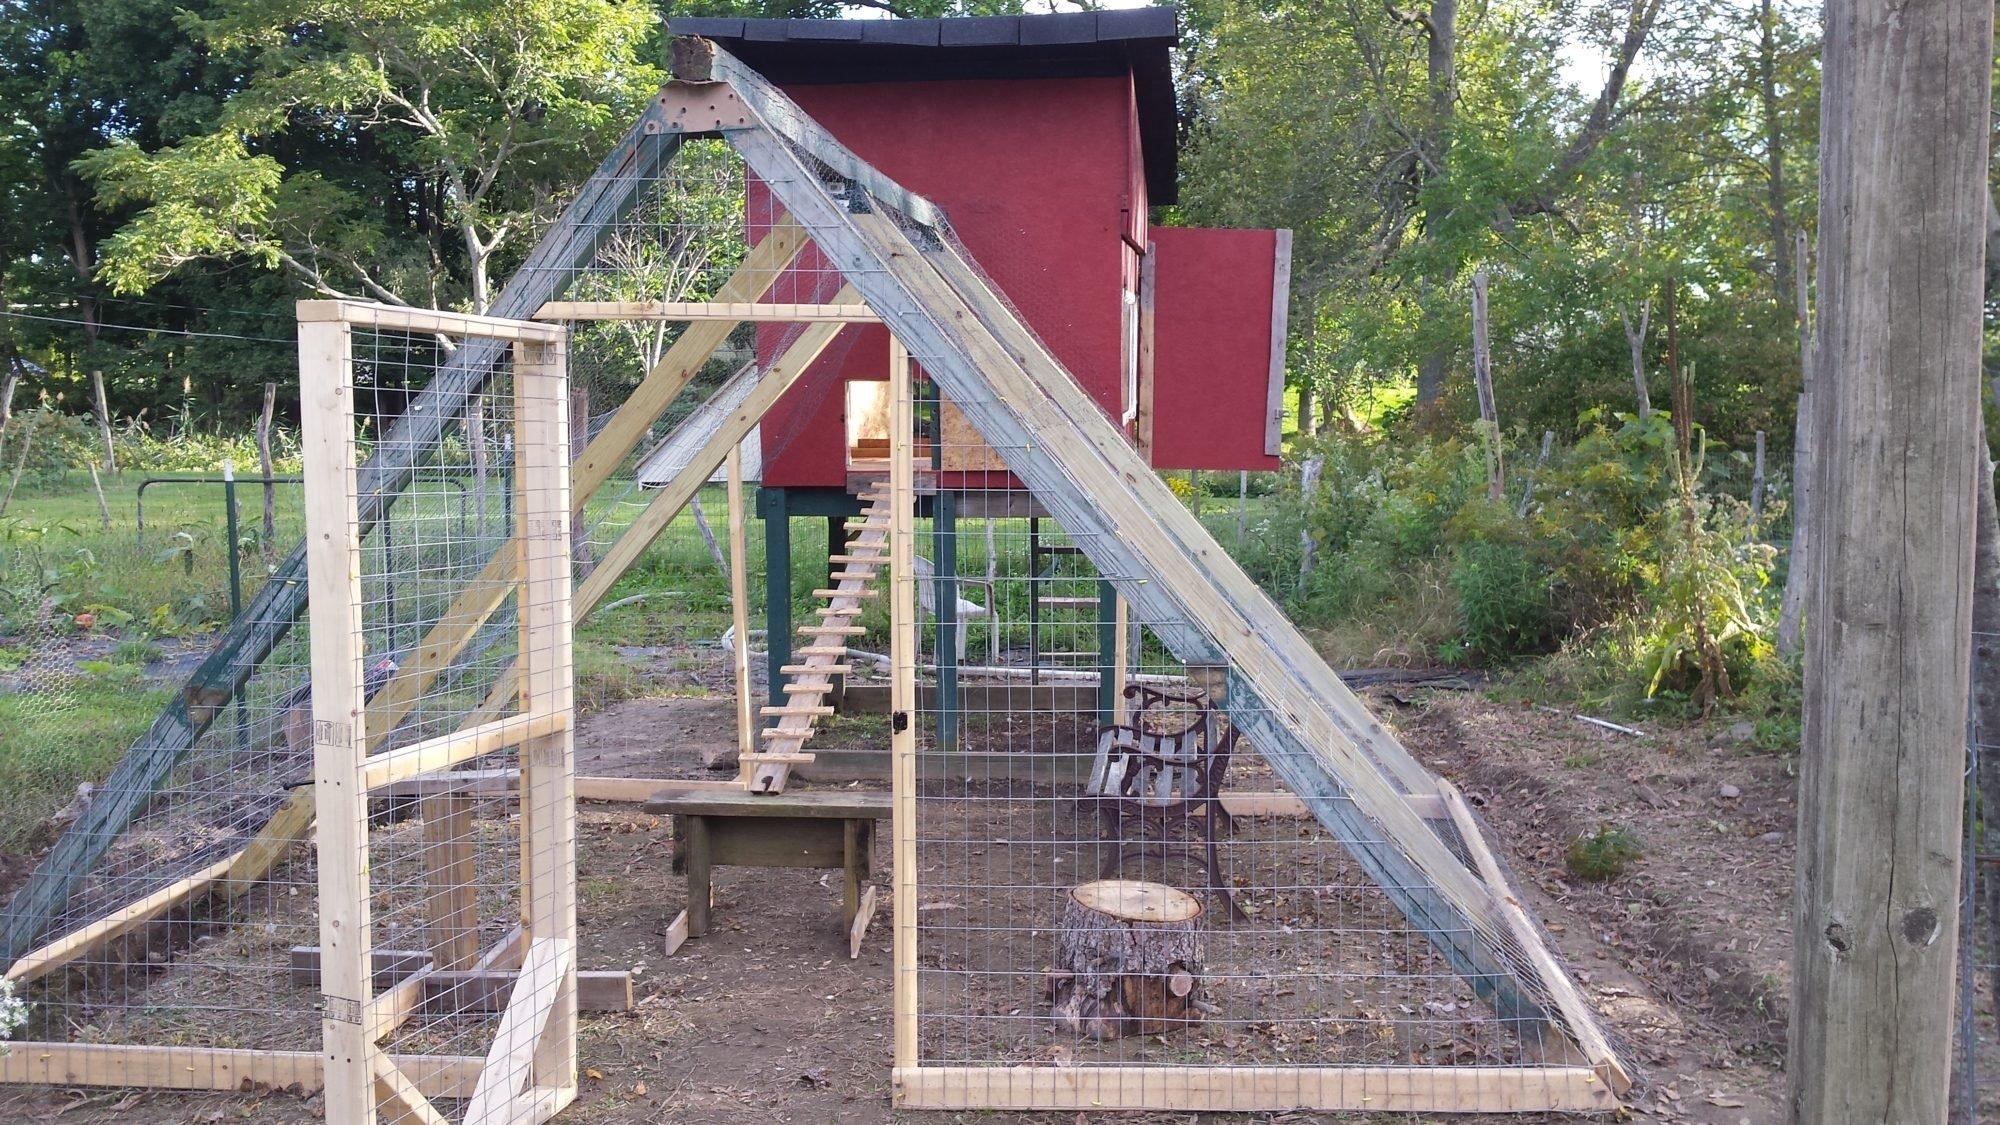 Added ramp access